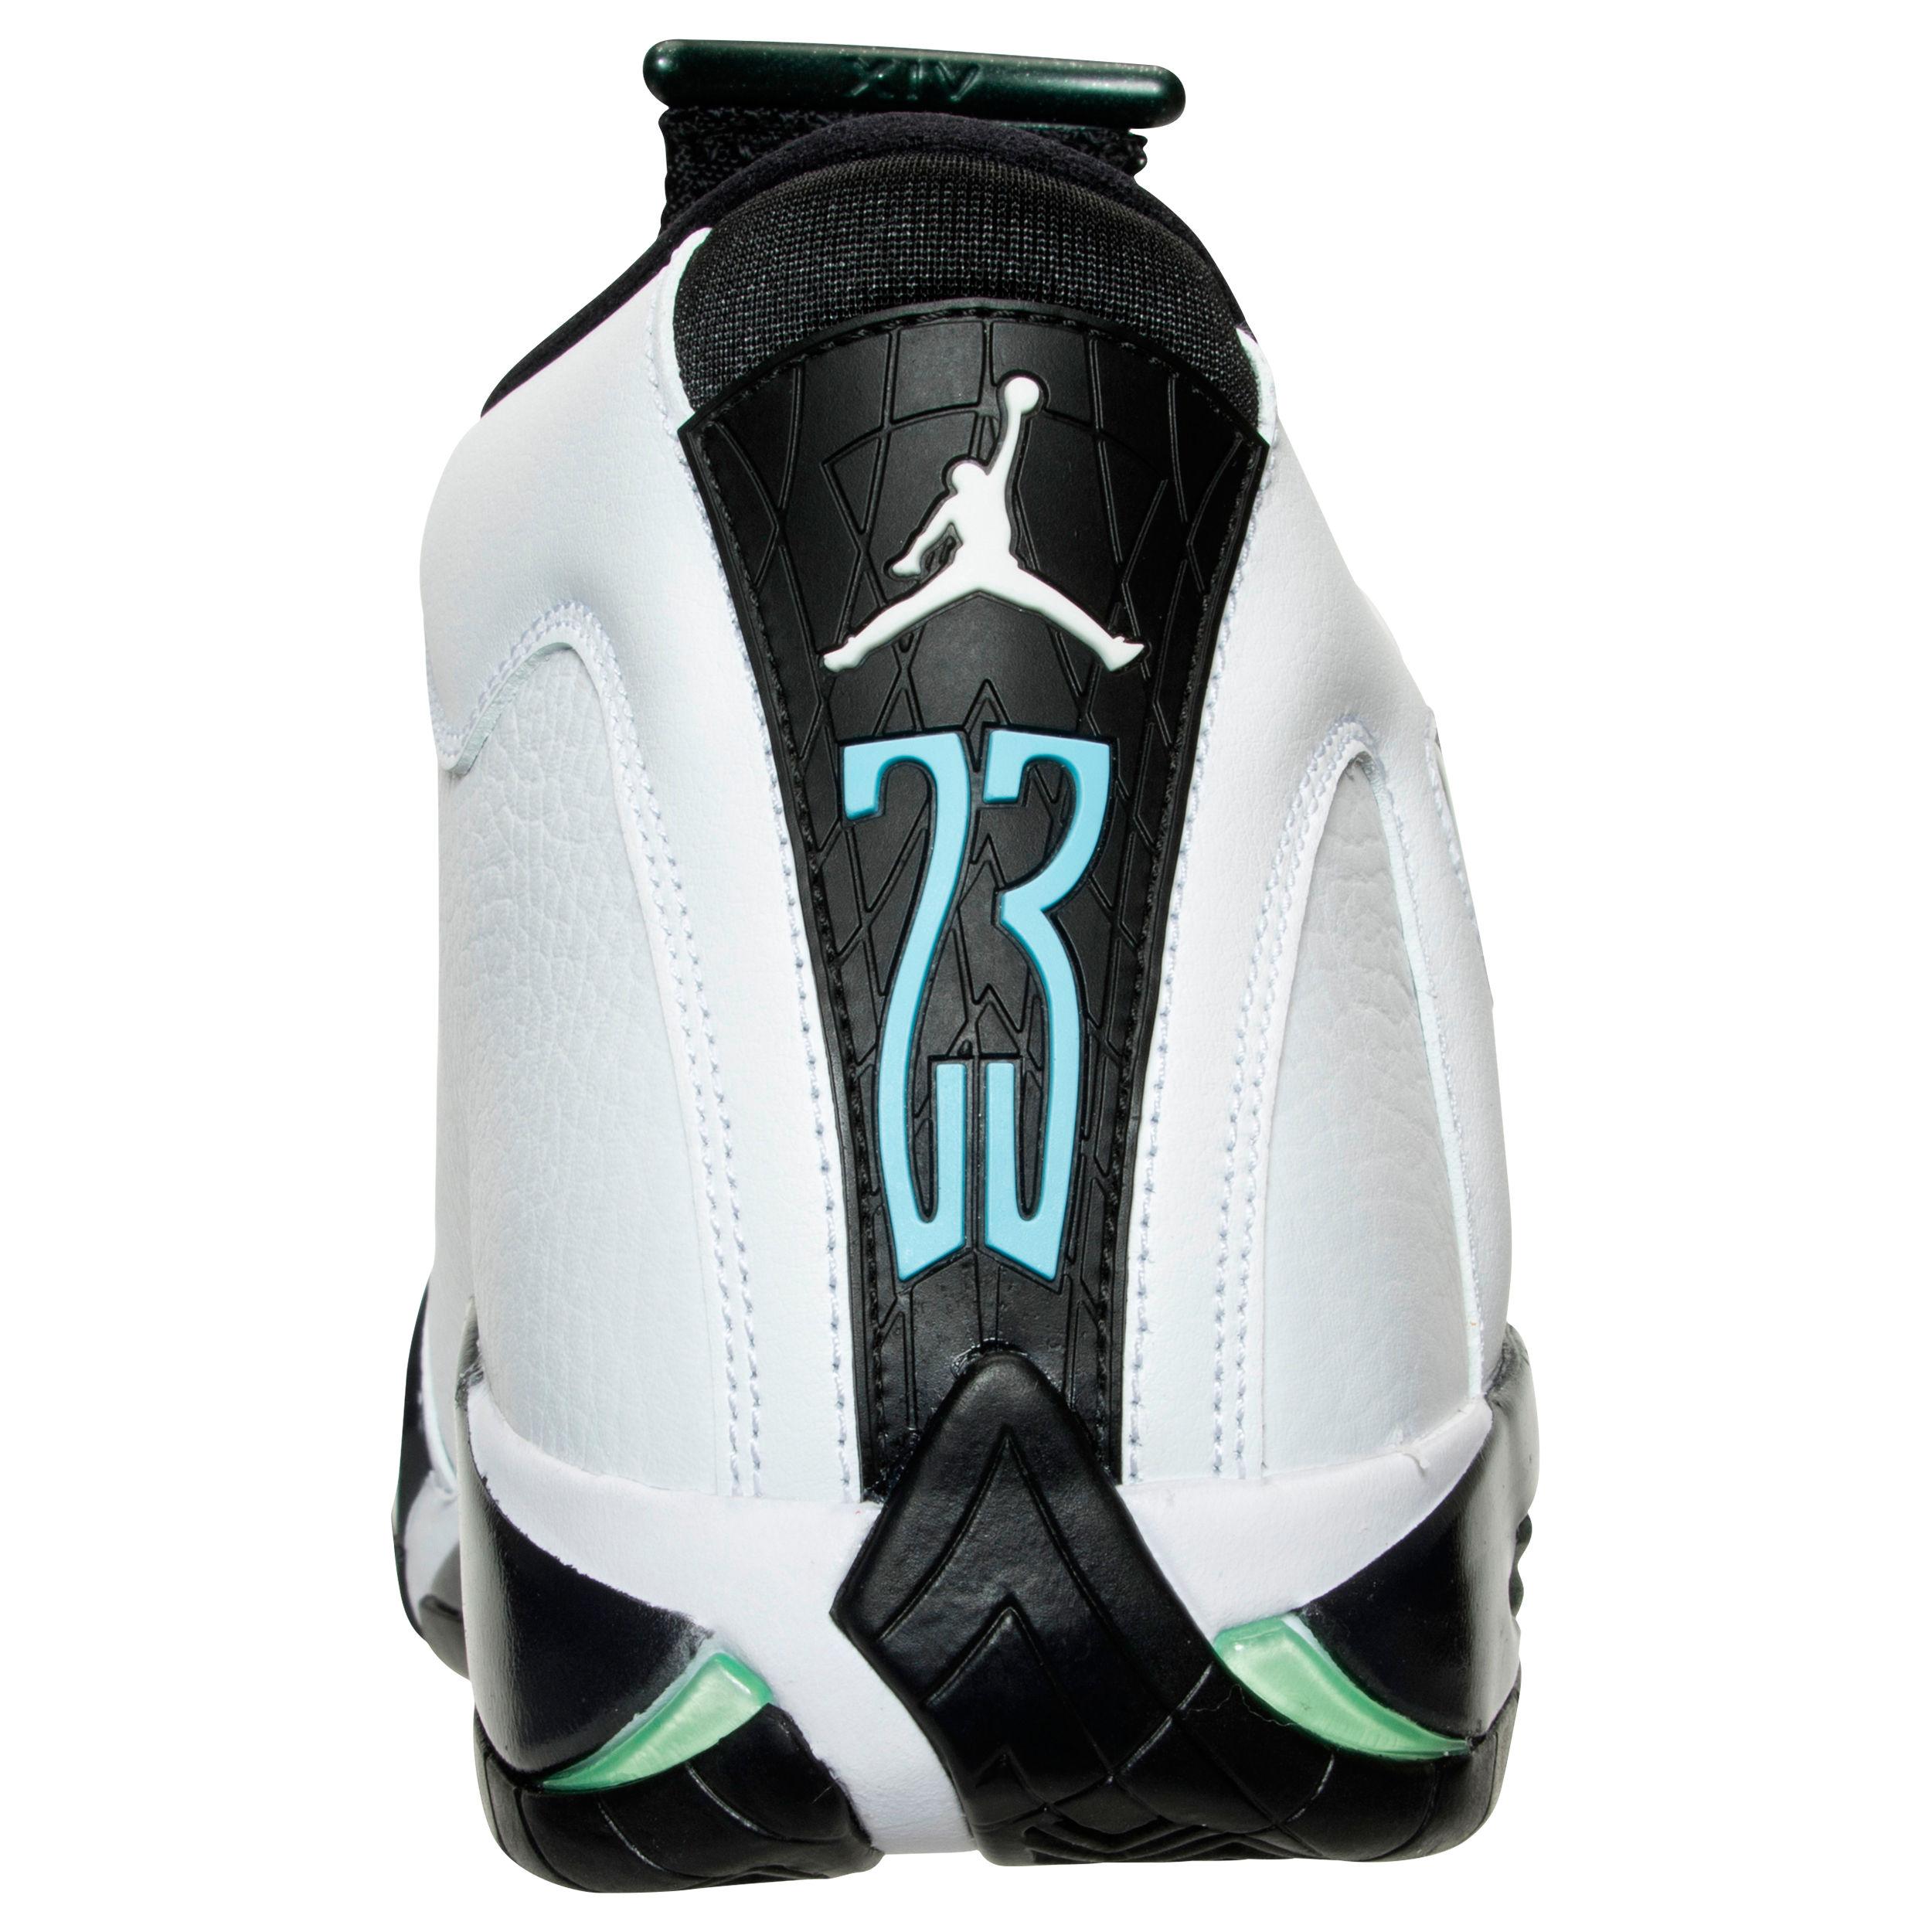 Air Jordan XIV Retro oxidized green 6